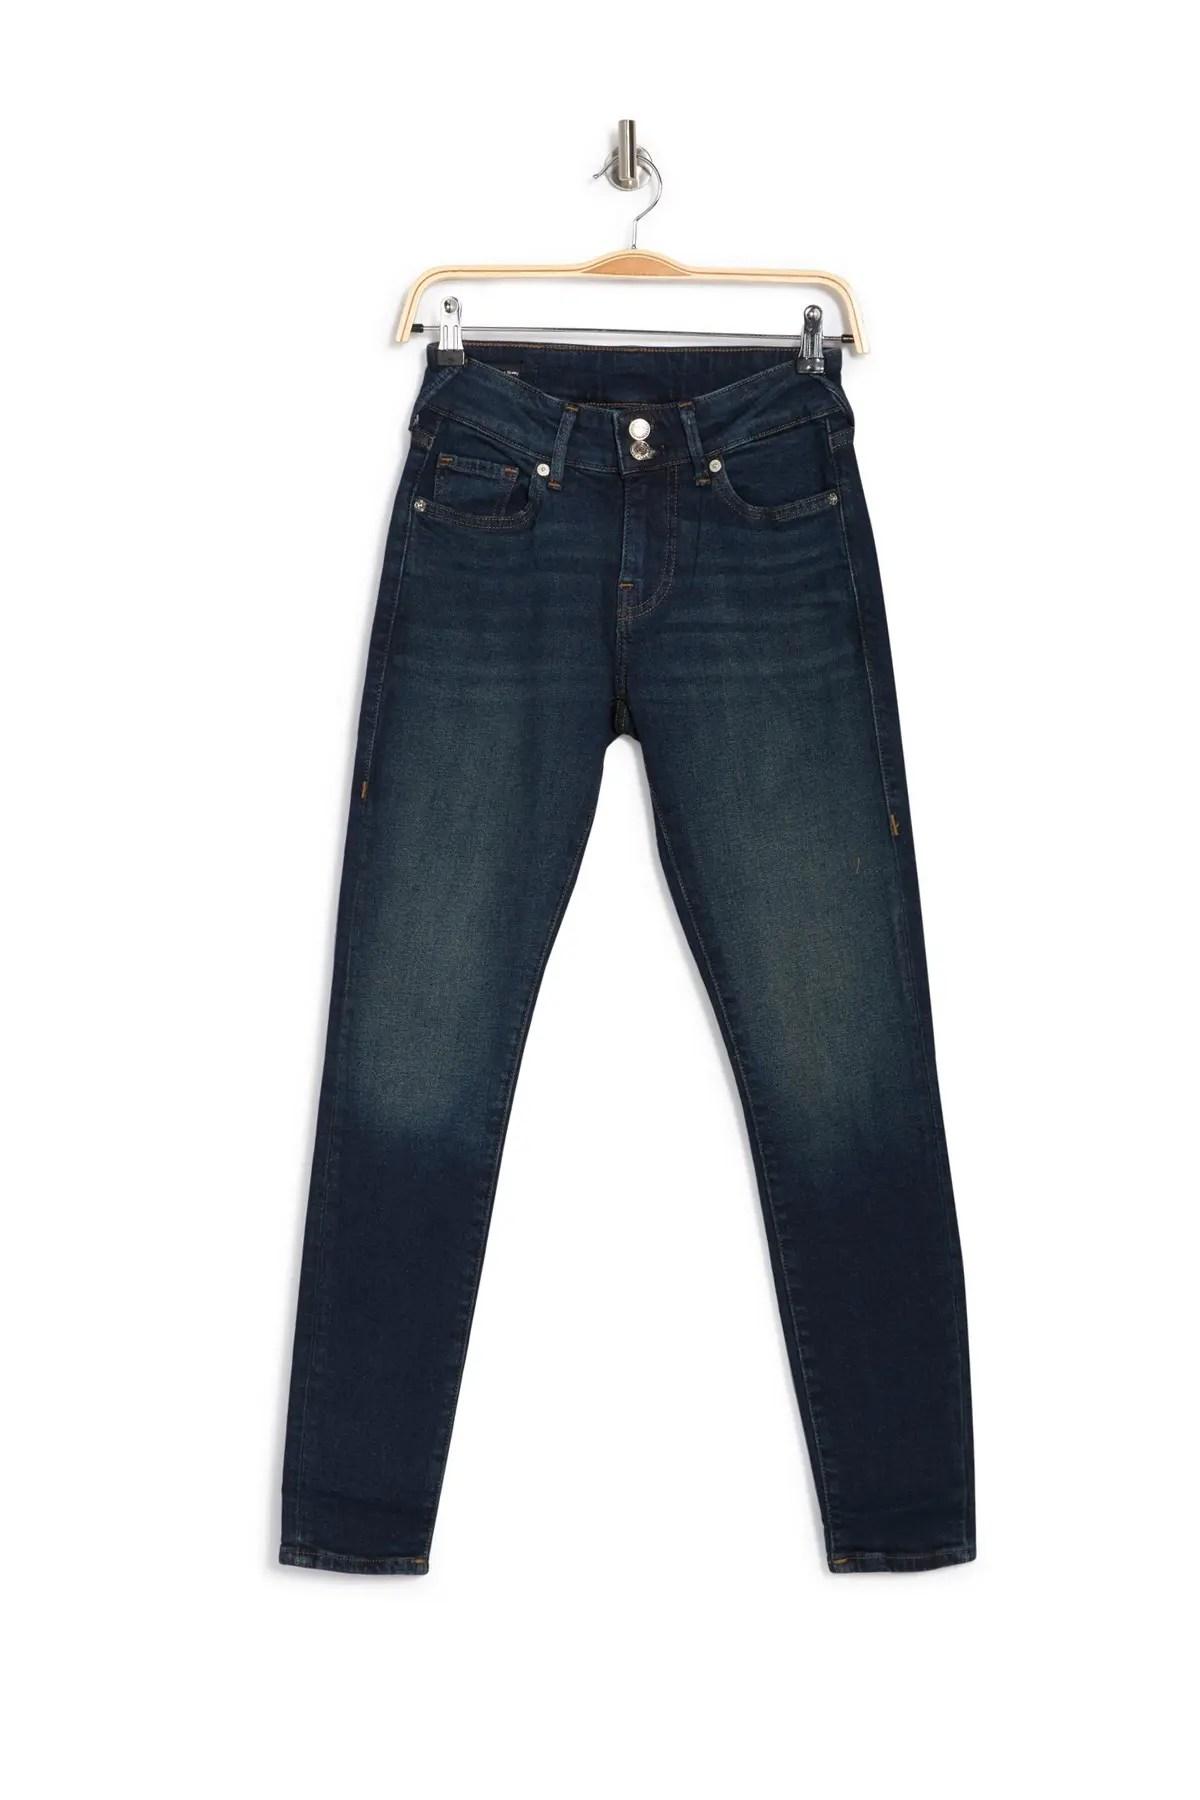 true religion jennie wide waist mid rise curvy skinny jeans nordstrom rack